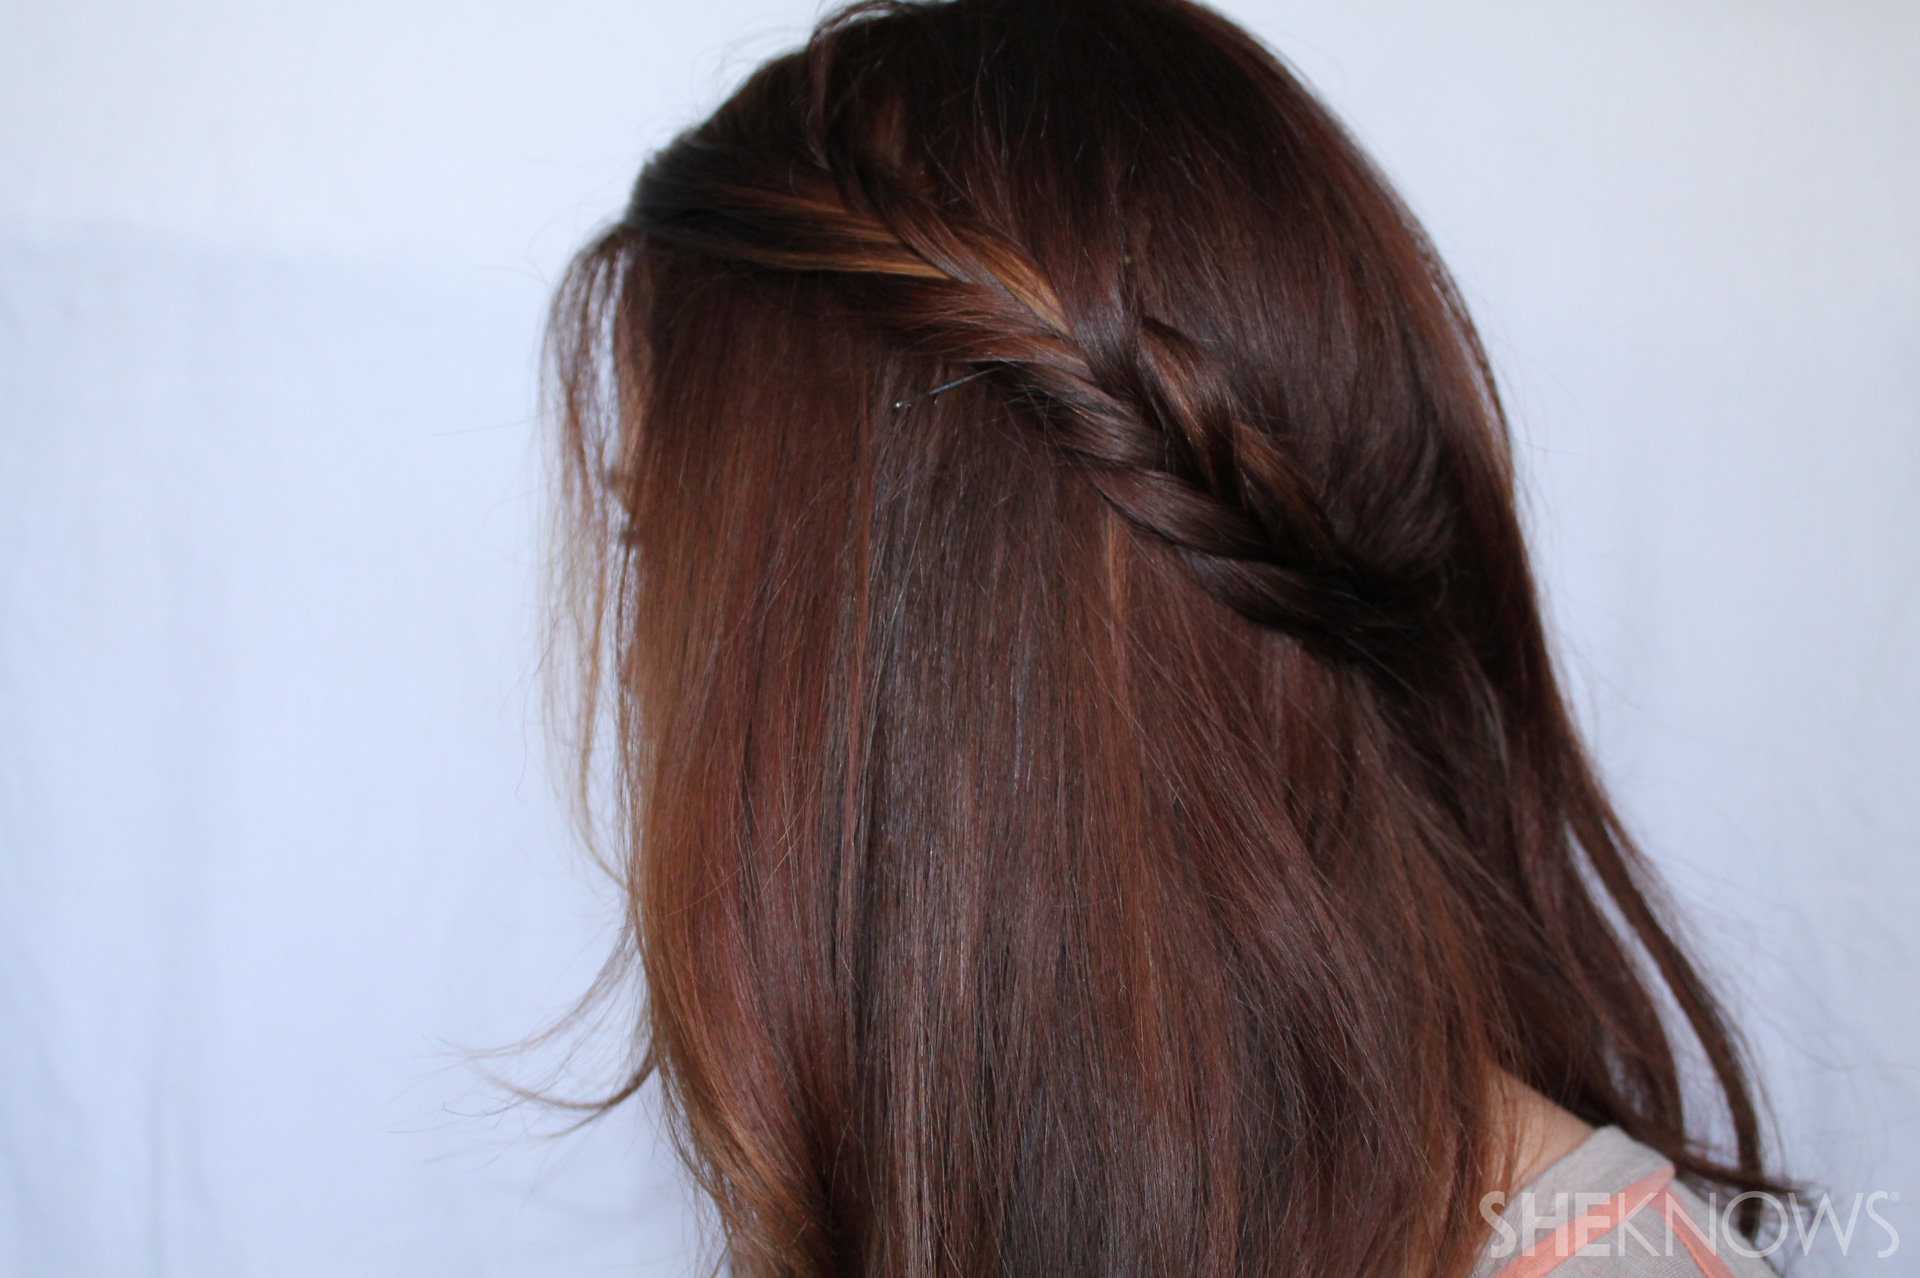 Crown braid | Sheknows.com - step 03